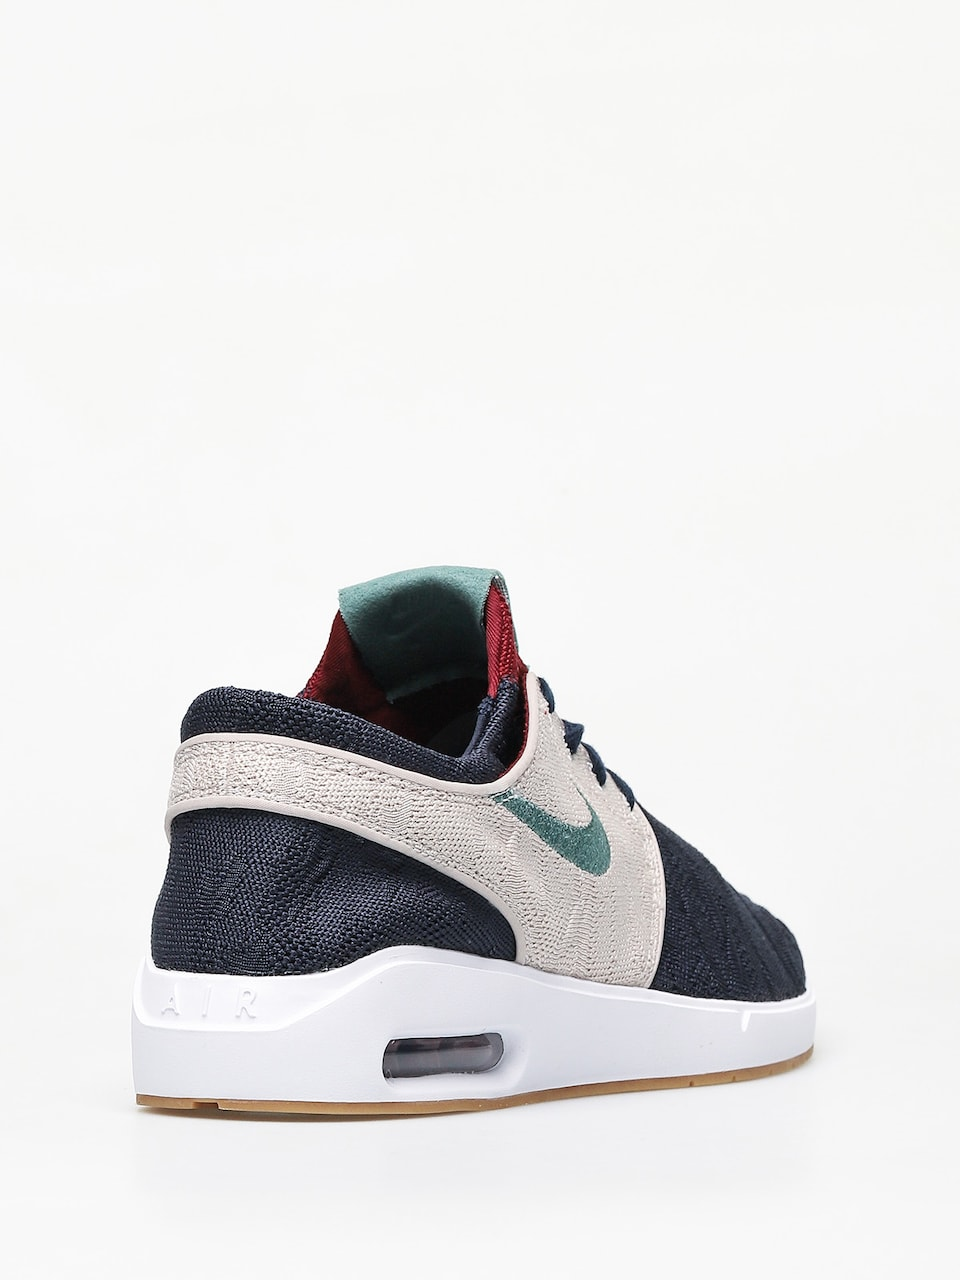 Buty Nike SB Air Max Janoski 2 (obsidianbicoastal desert sand)